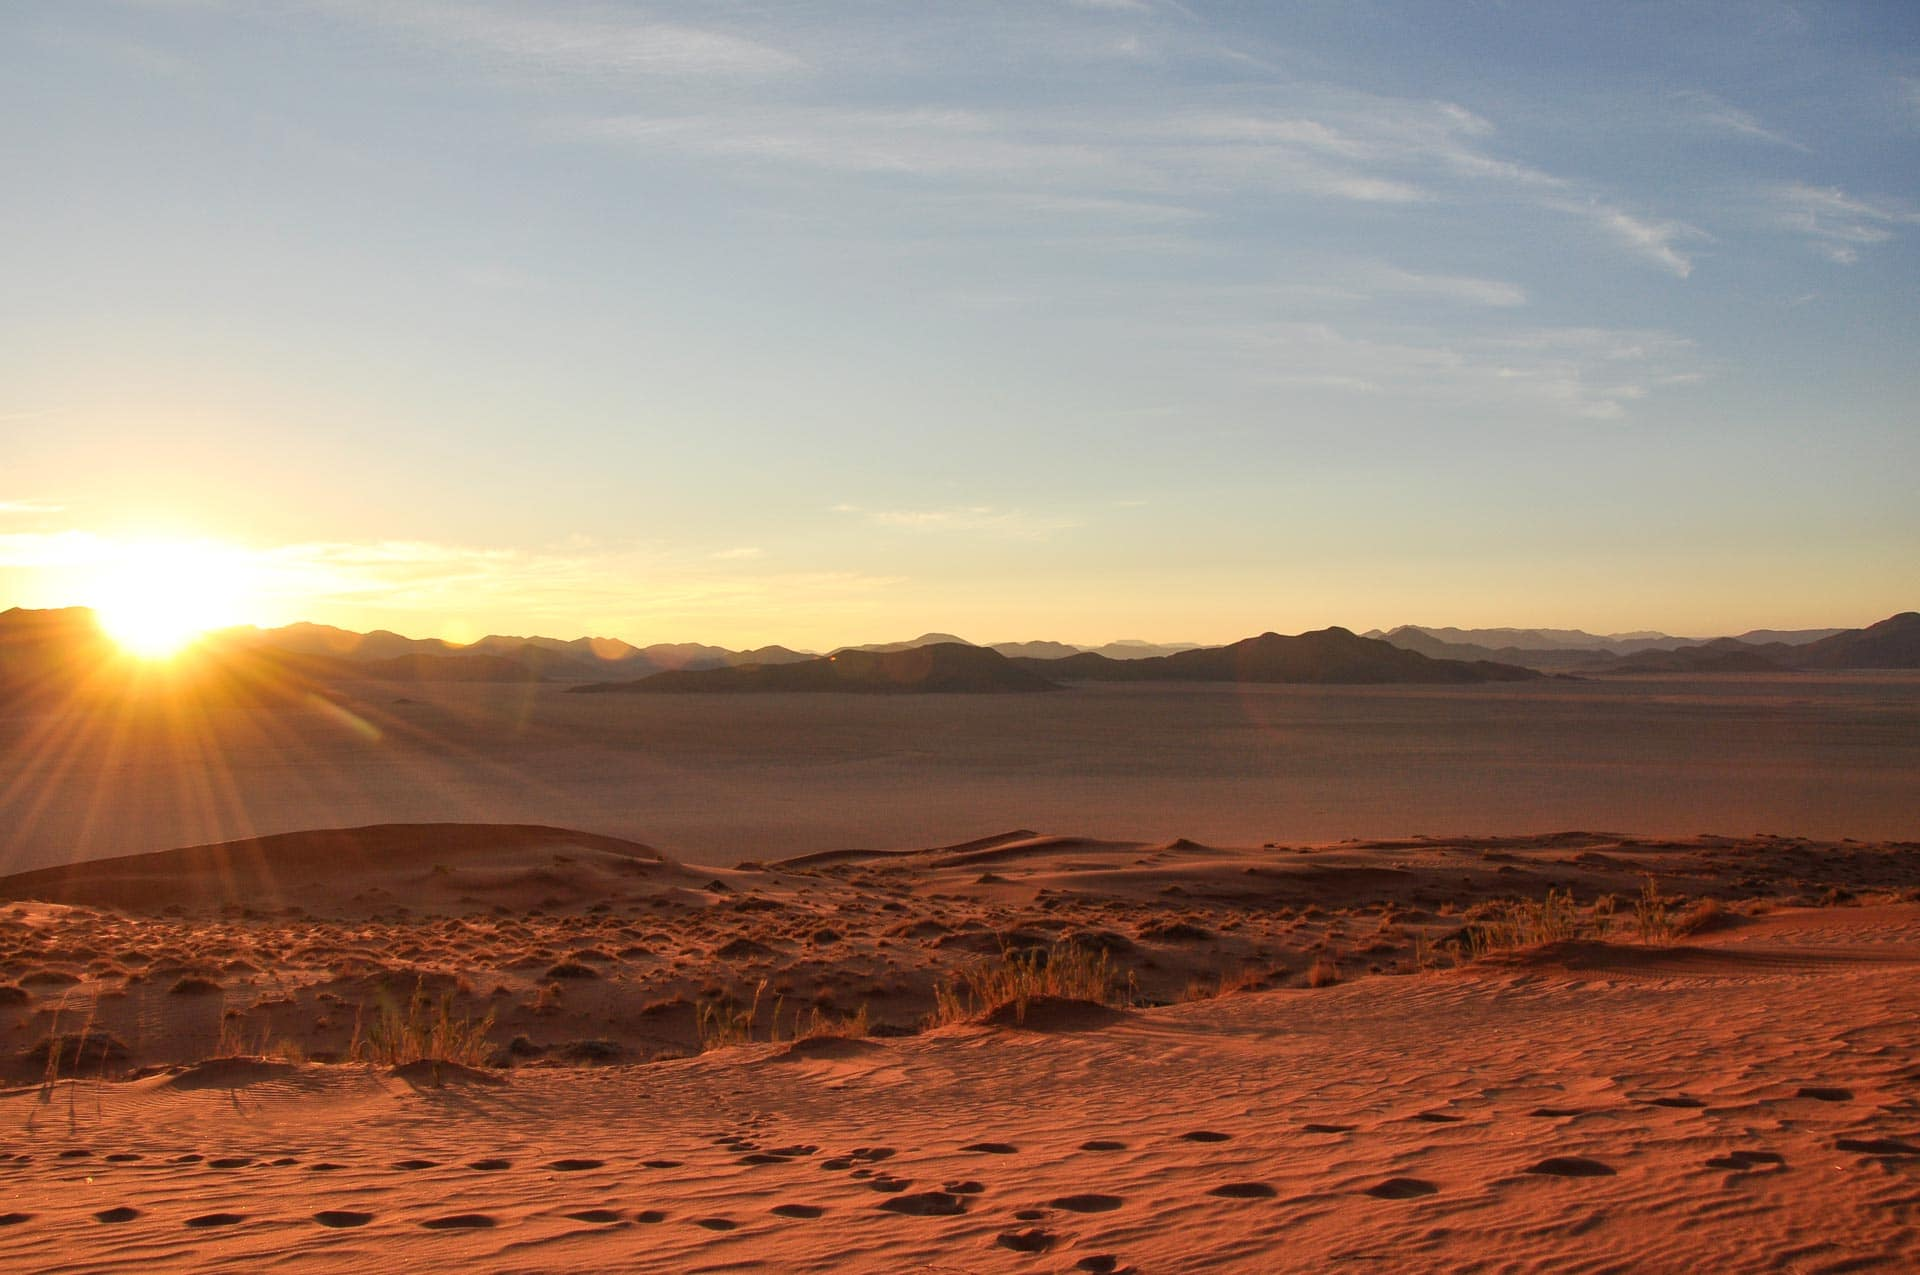 Kanaan-Desert-Retreat-Namibia-Globetrotter-Select-27